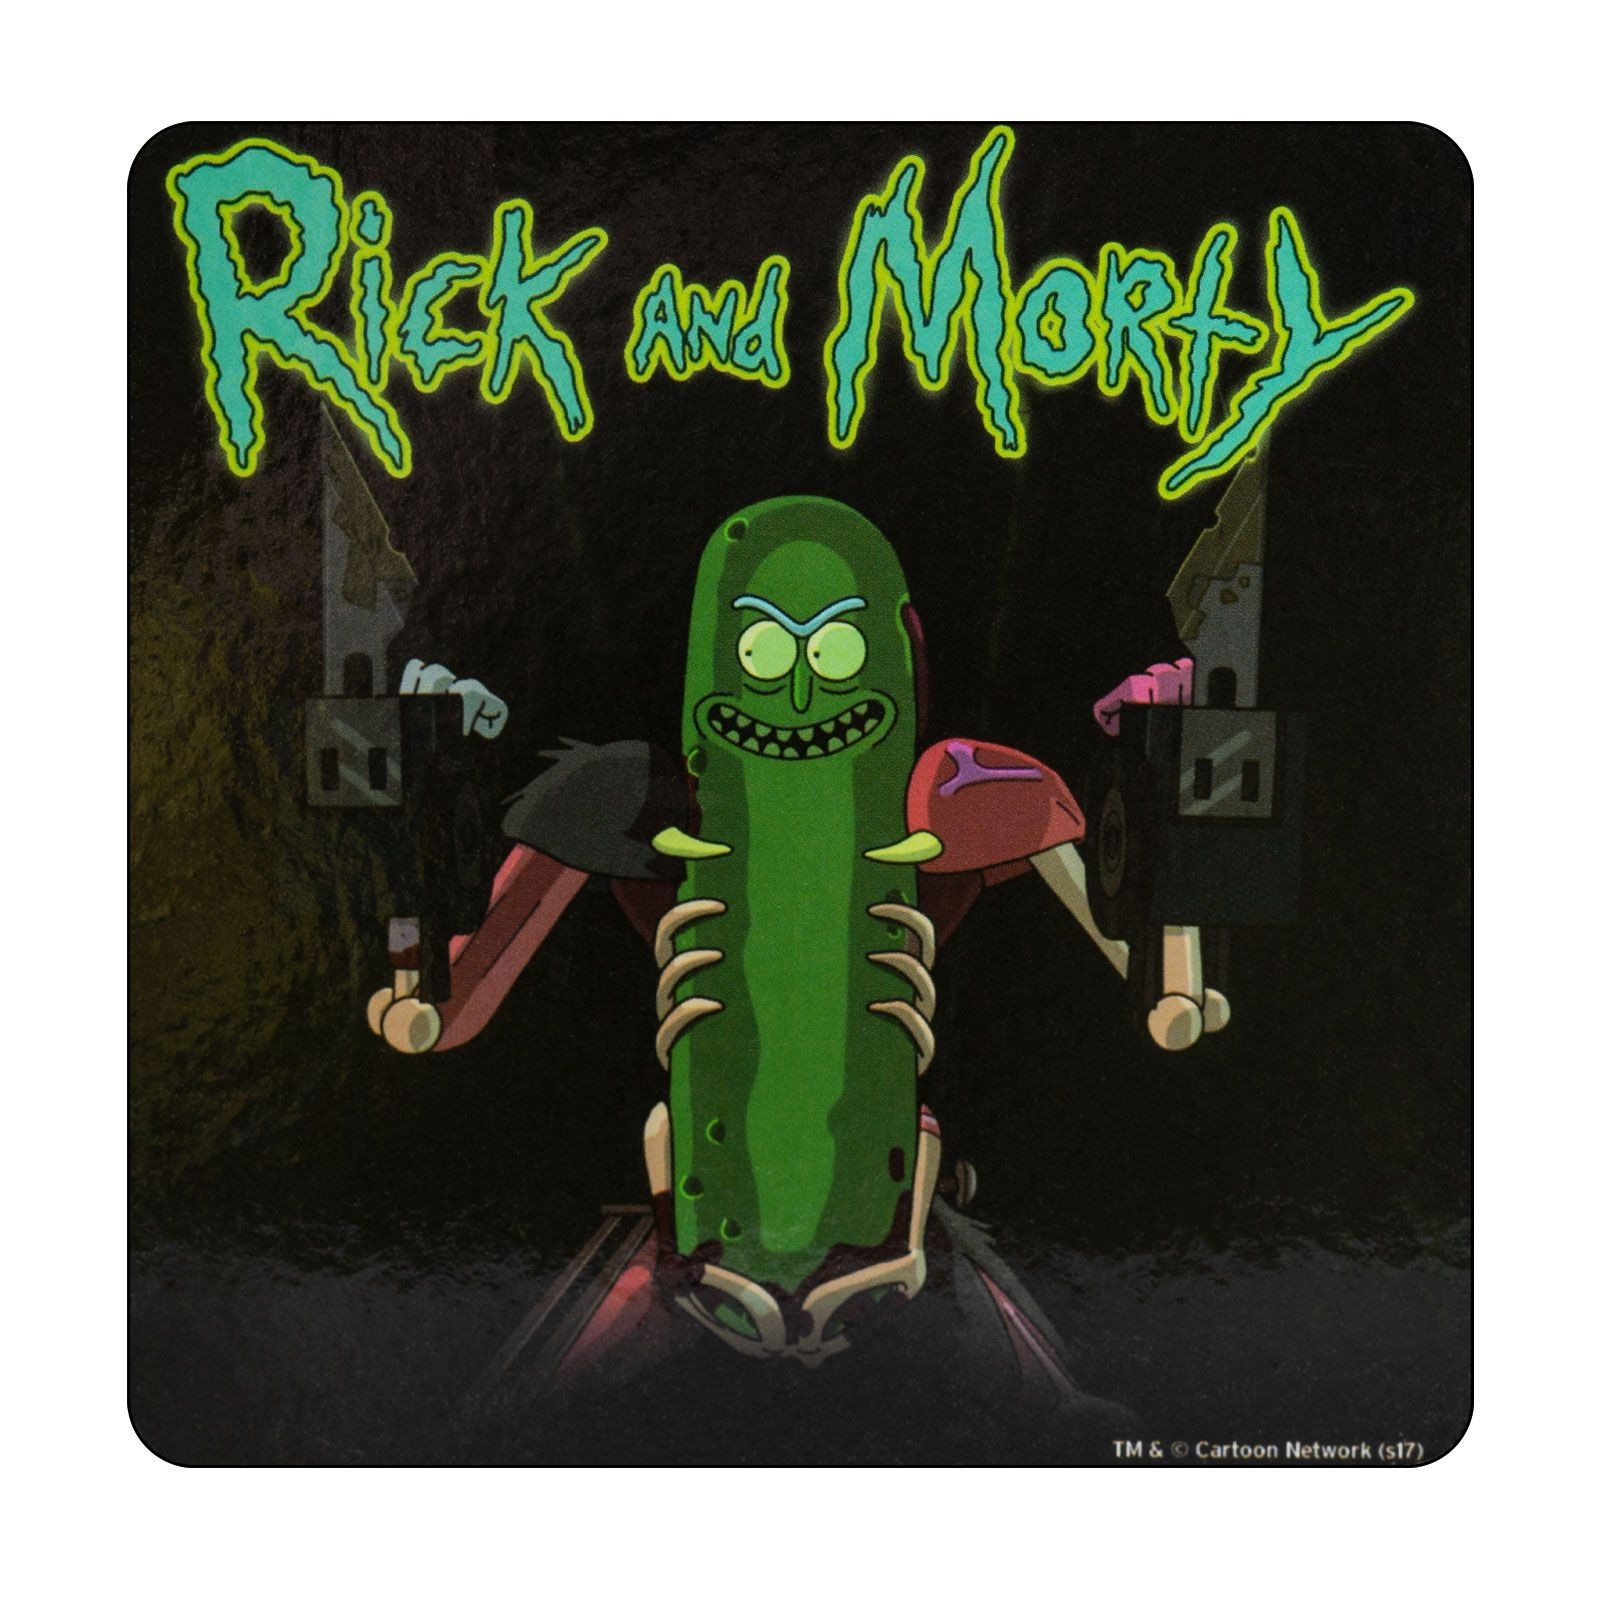 Rick and Morty (Pickle Rick) set